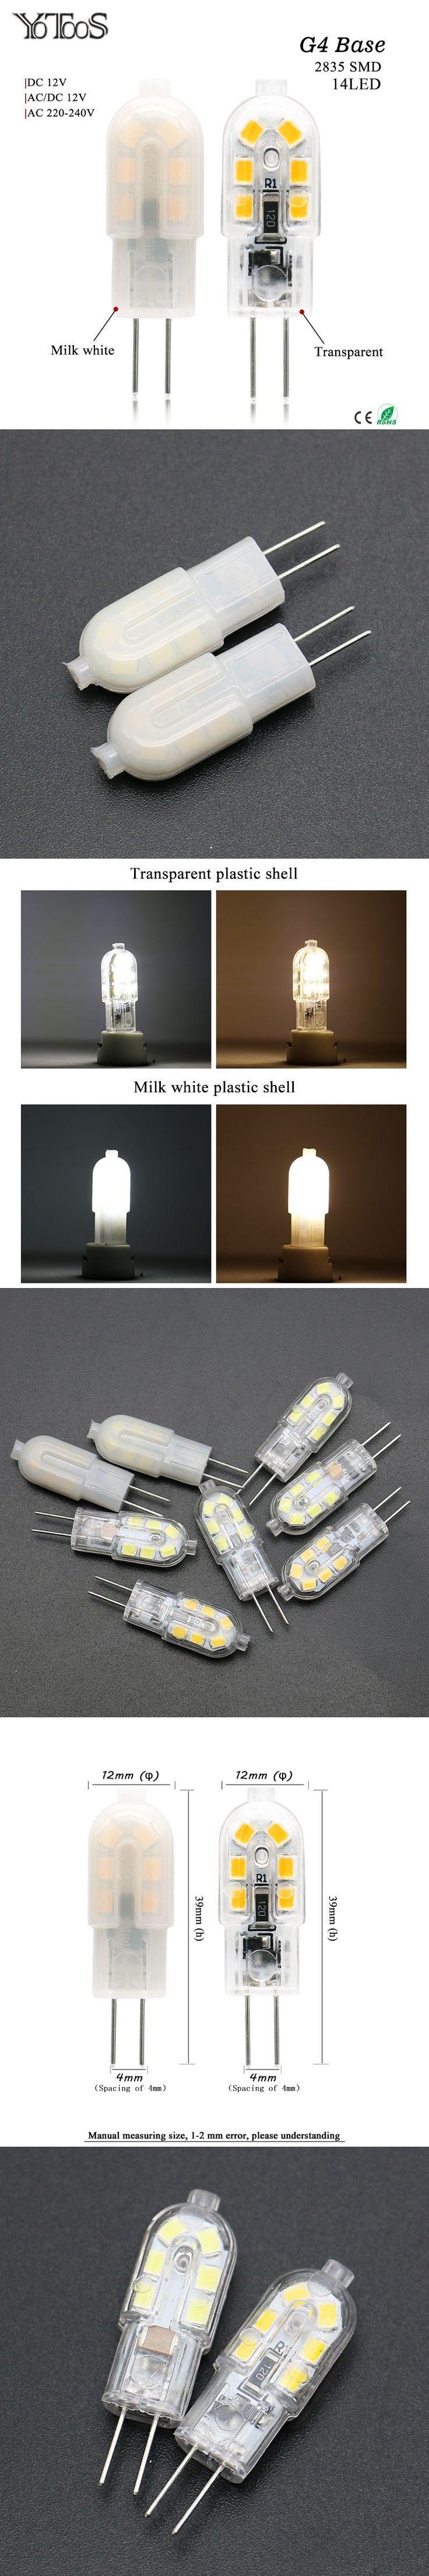 Best 25 g4 led ideas on pinterest industrial table lamps yotoos led lamp mini g4 led corn bulb smd 2835 led light 15w ac arubaitofo Gallery